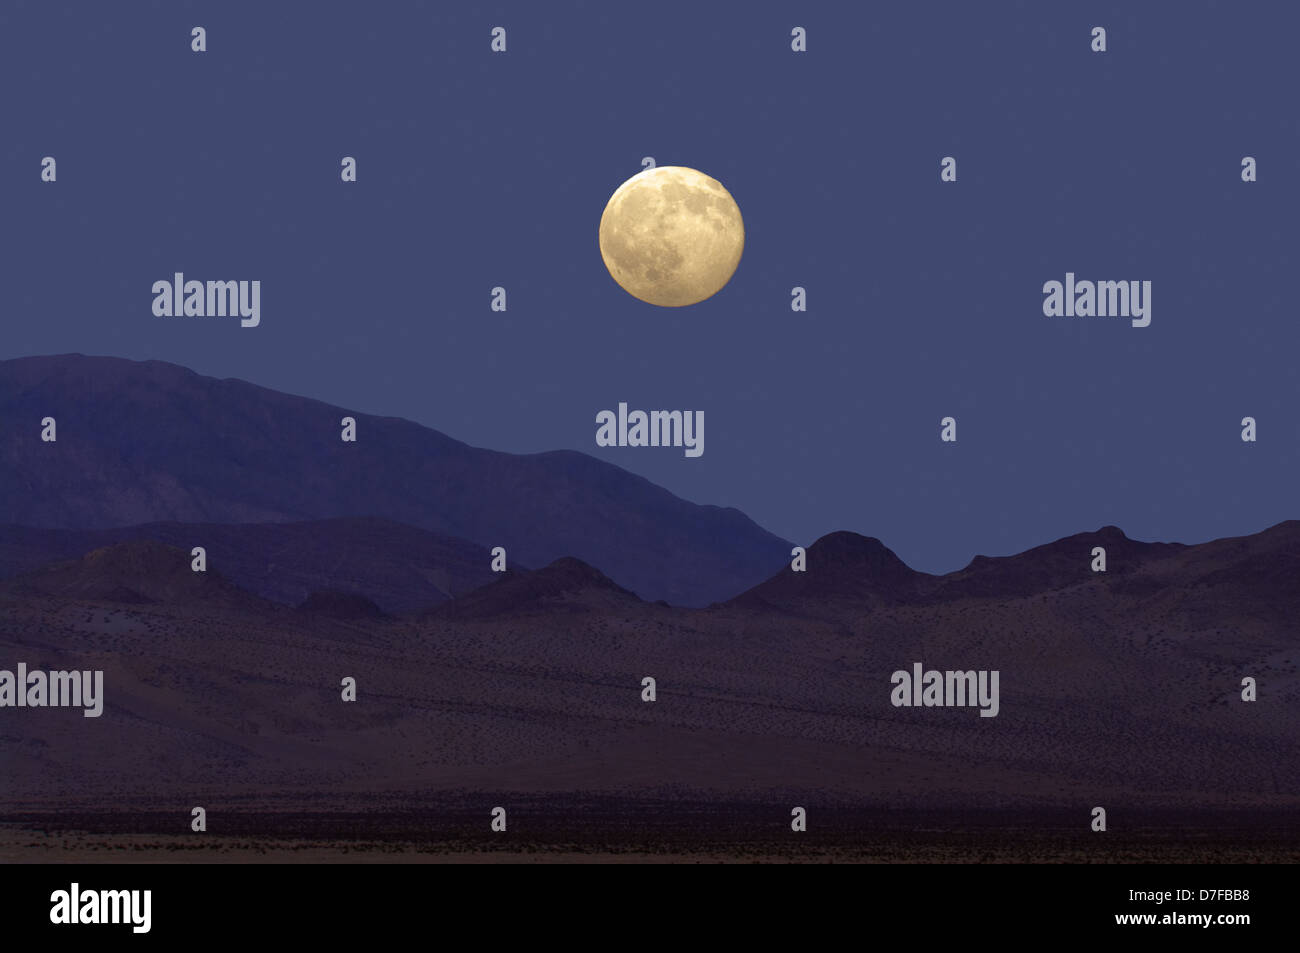 Moon rise at the Mojave Desert, California, USA. - Stock Image